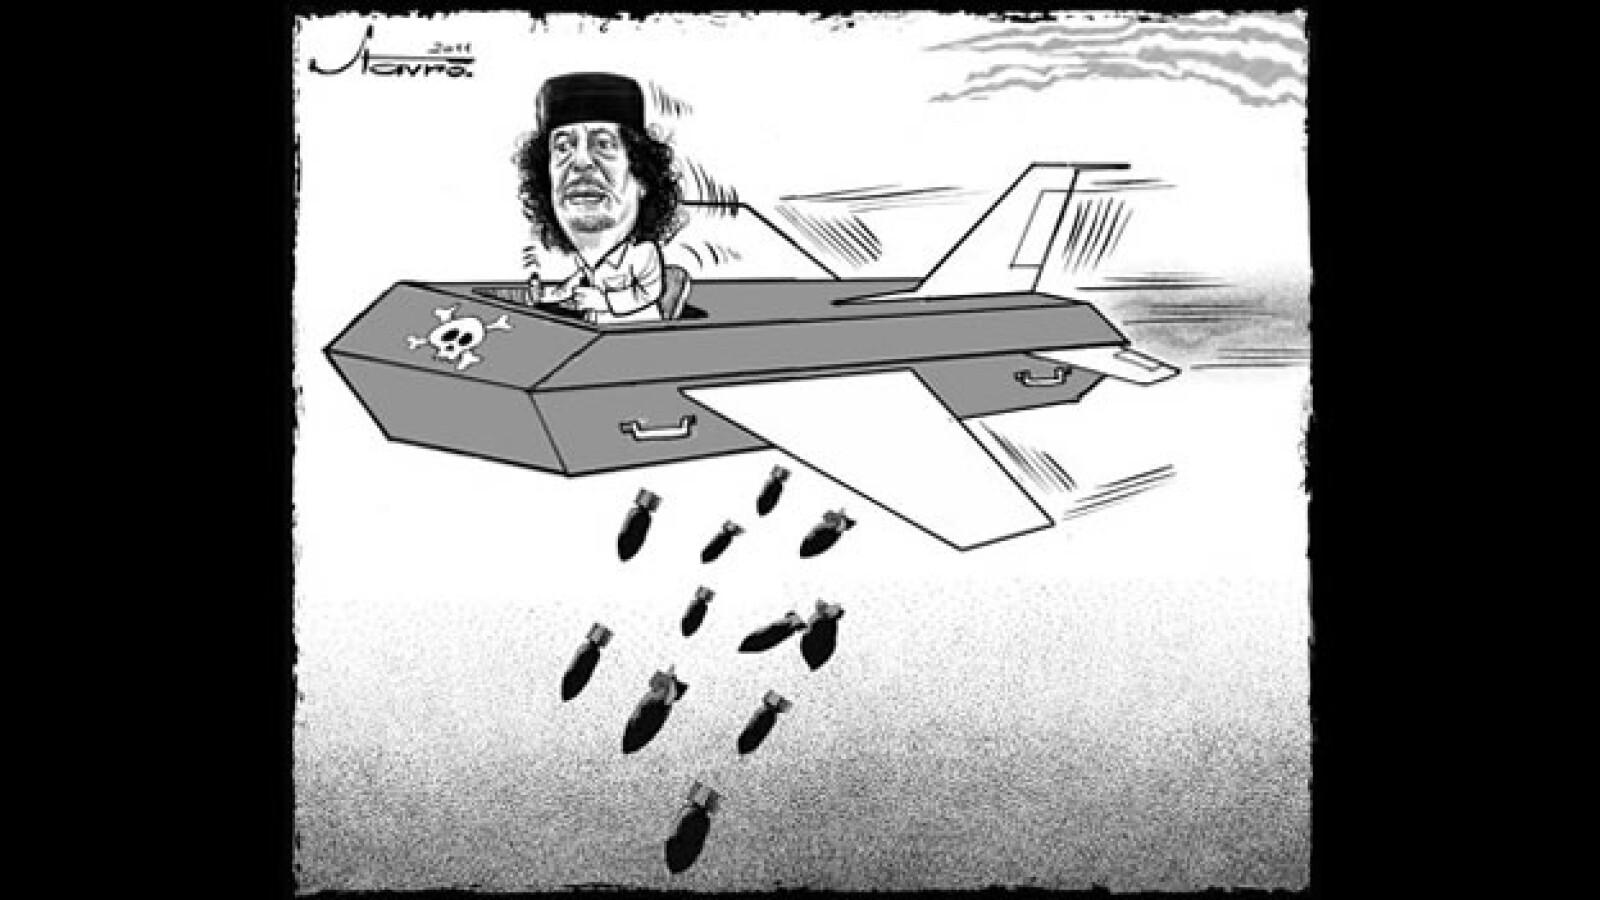 Gadhafi - caricatura - Stavro Jabra